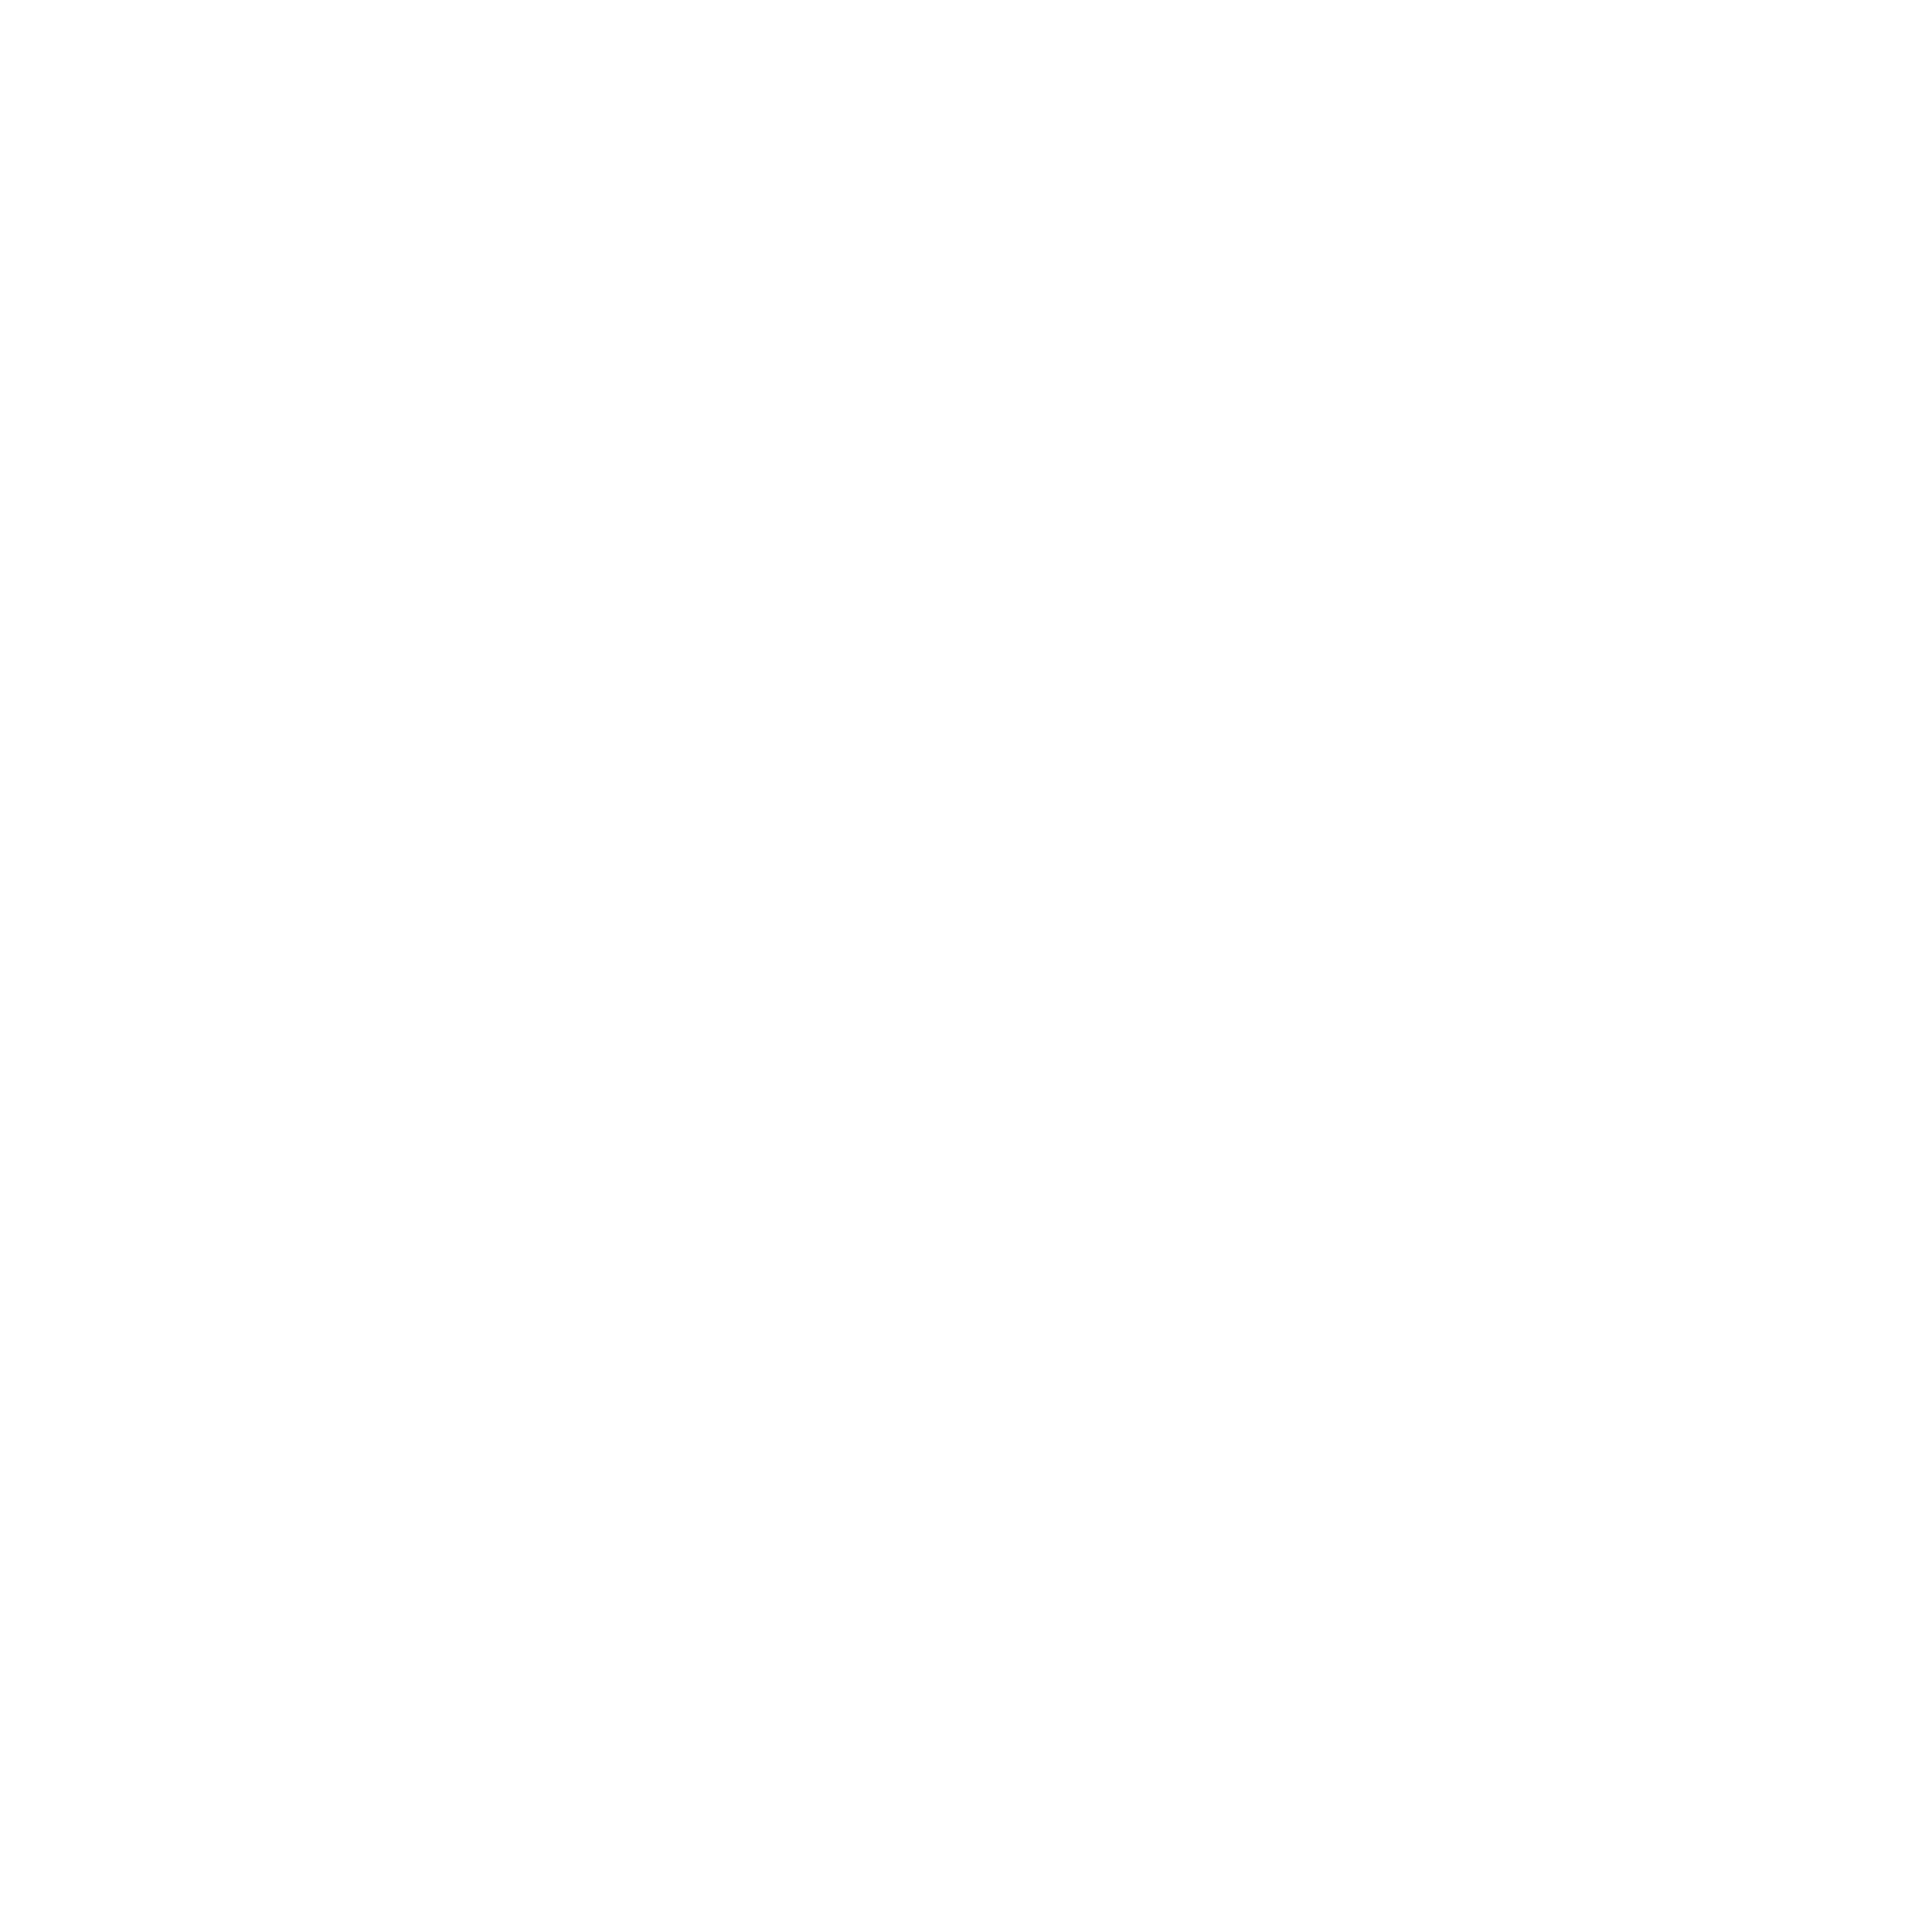 logo_musiccolor-1462287521.png